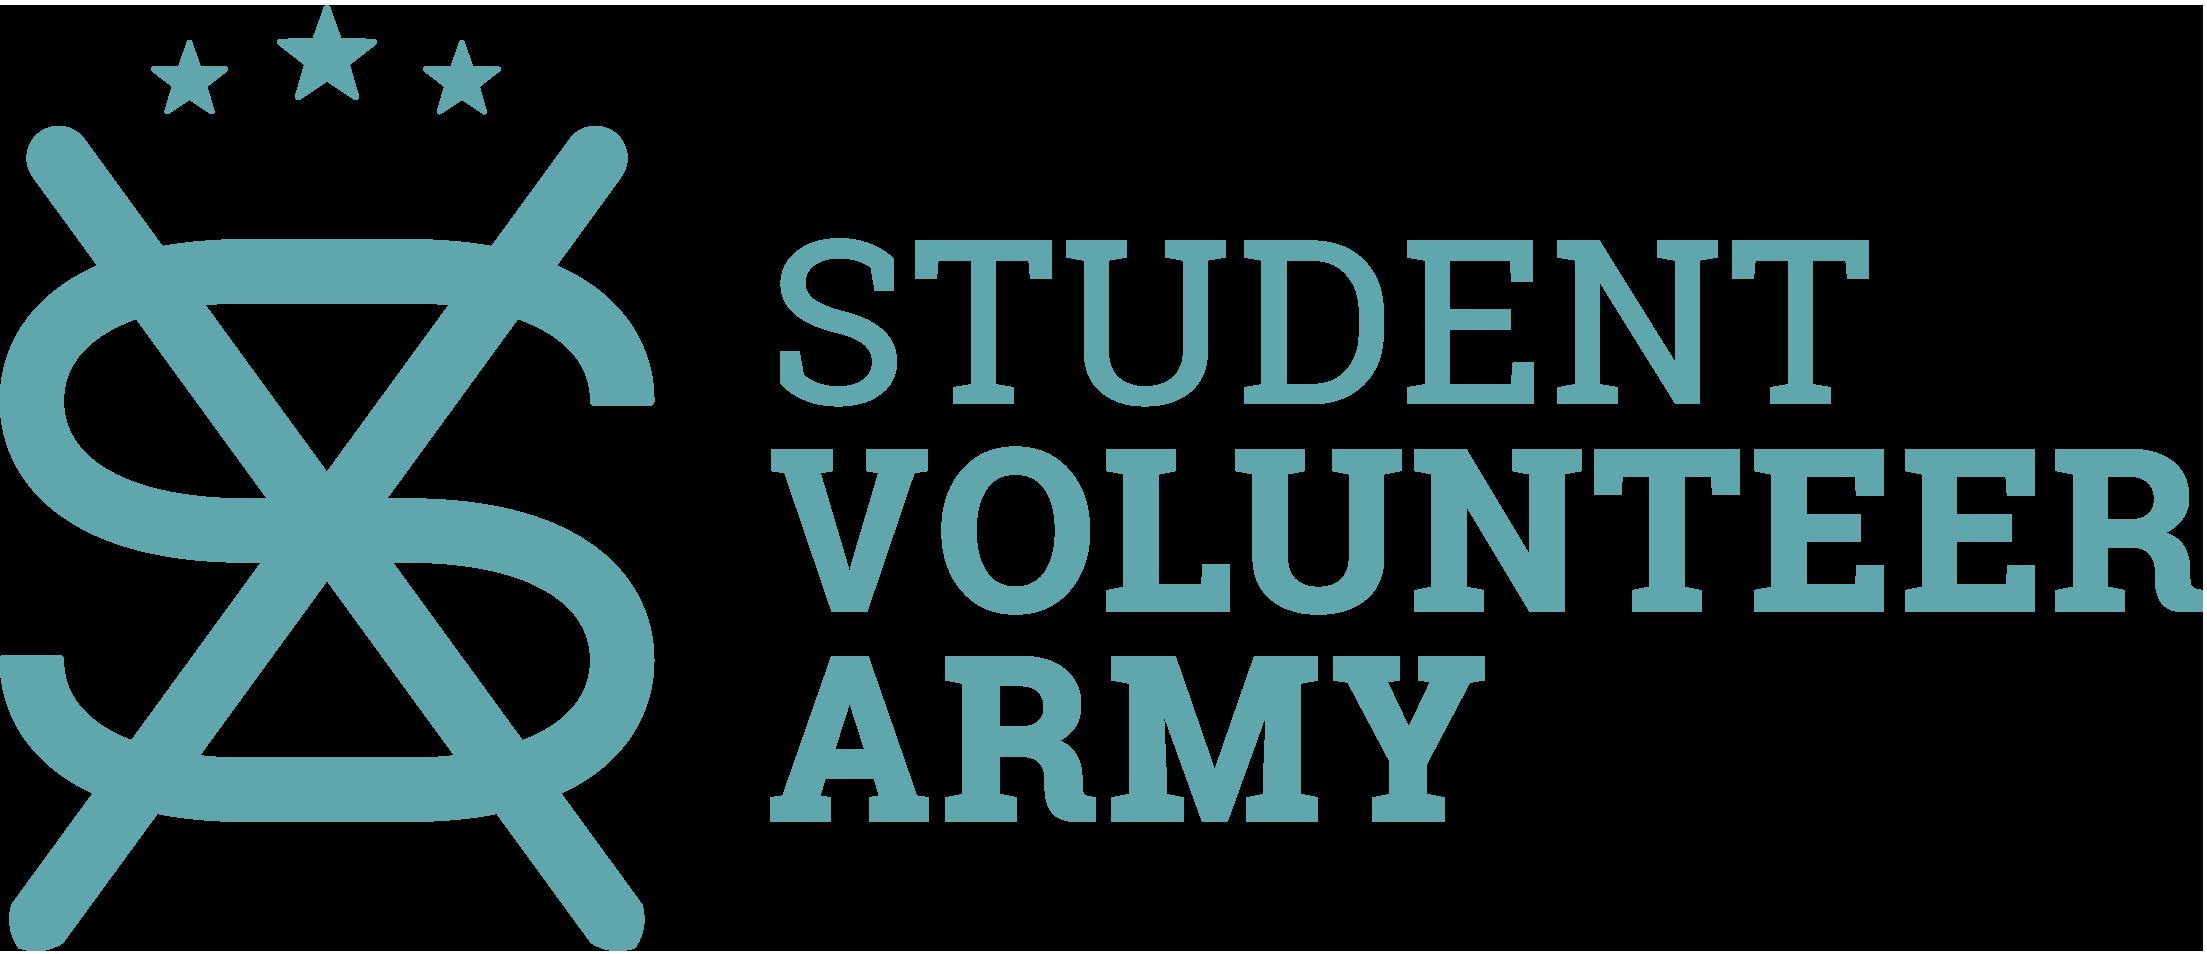 SVA new logo 2017 - screen colour trans back blue text copy.png